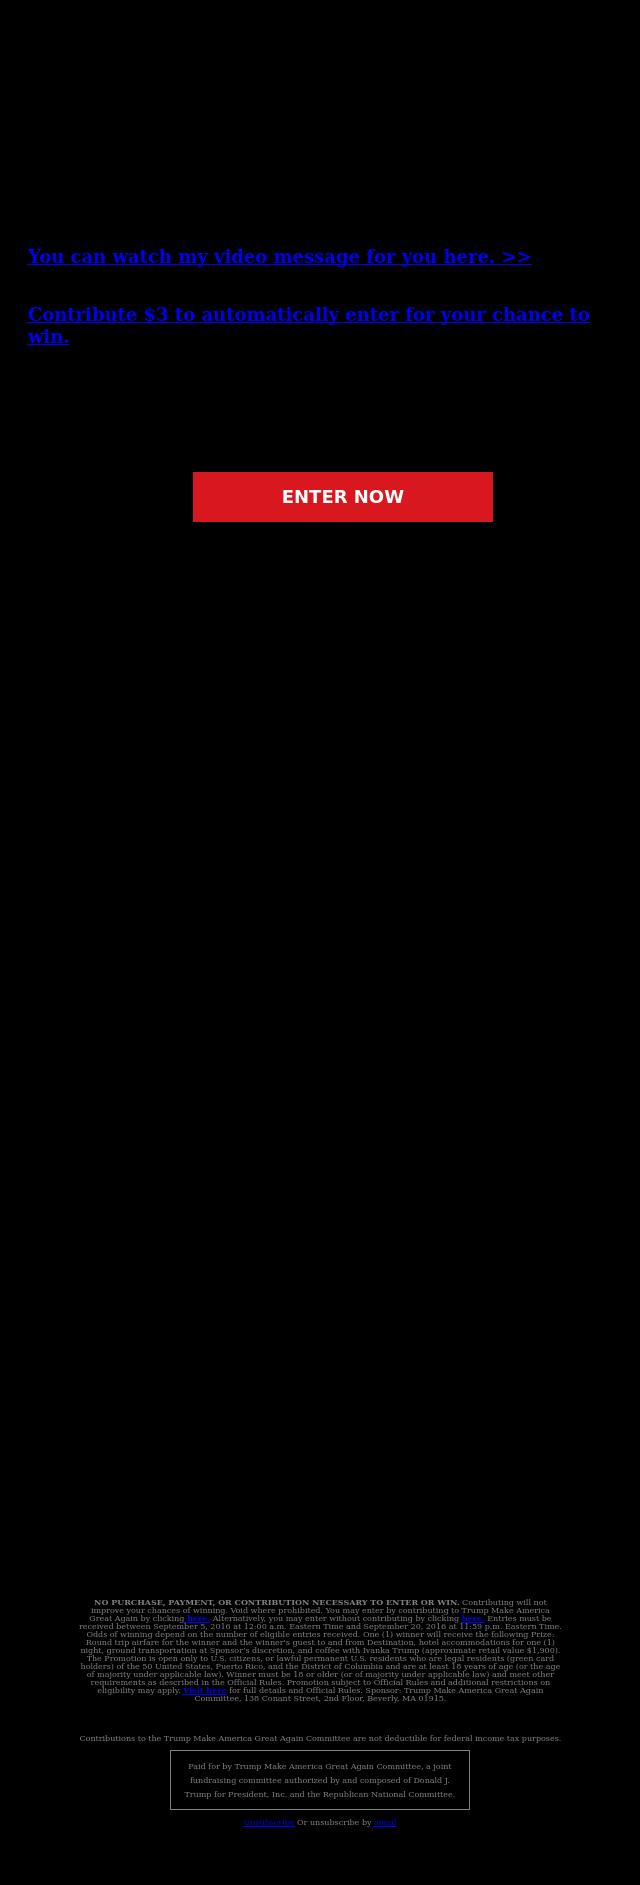 21c2f73c bfe1 415e ab24 67c52a0864df